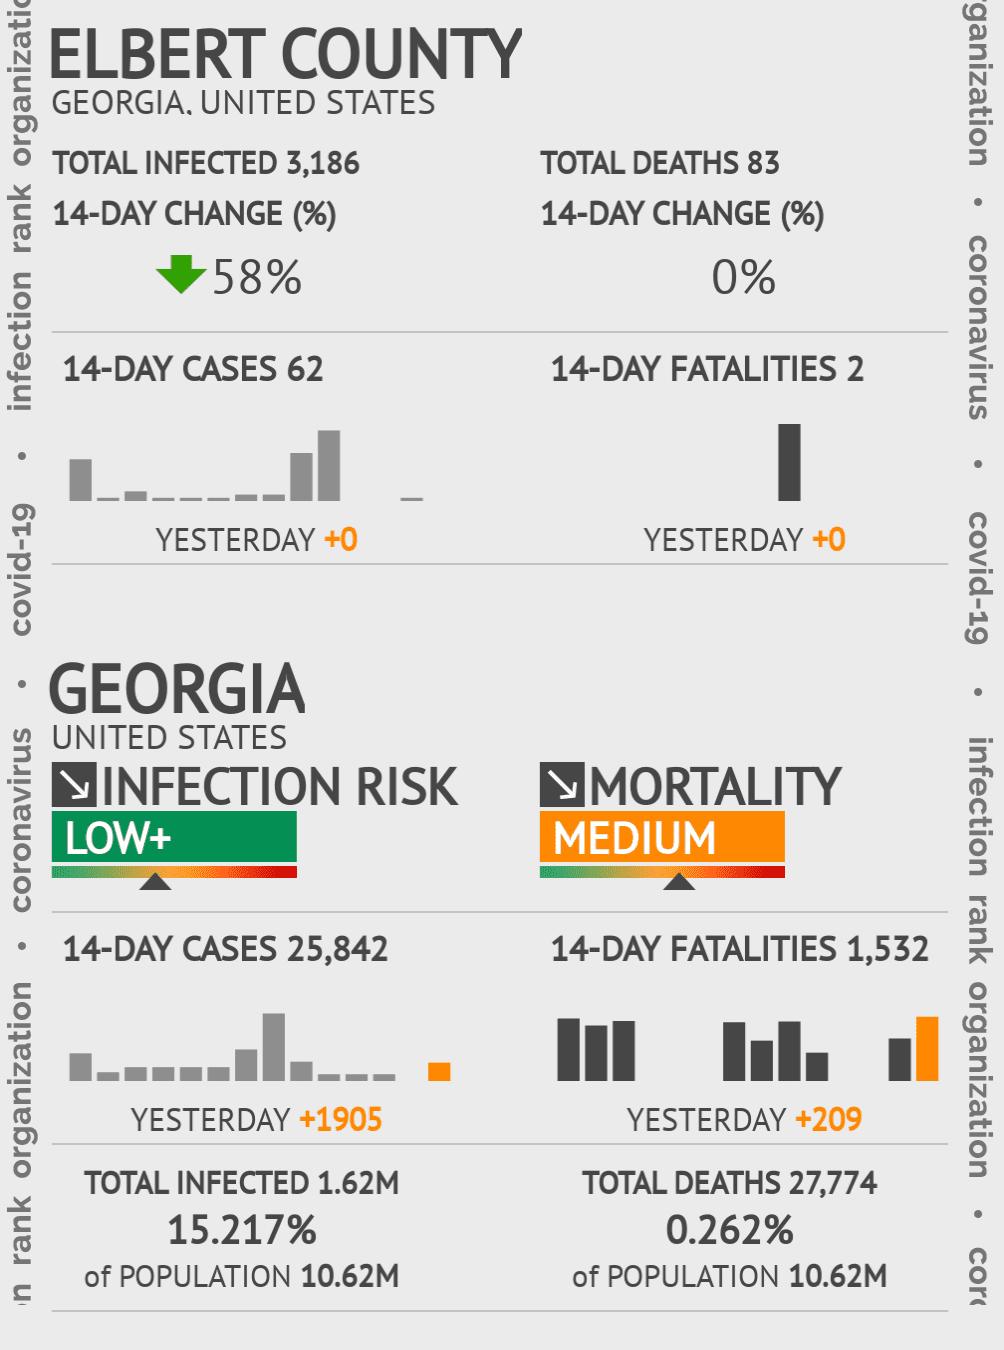 Elbert County Coronavirus Covid-19 Risk of Infection on November 29, 2020